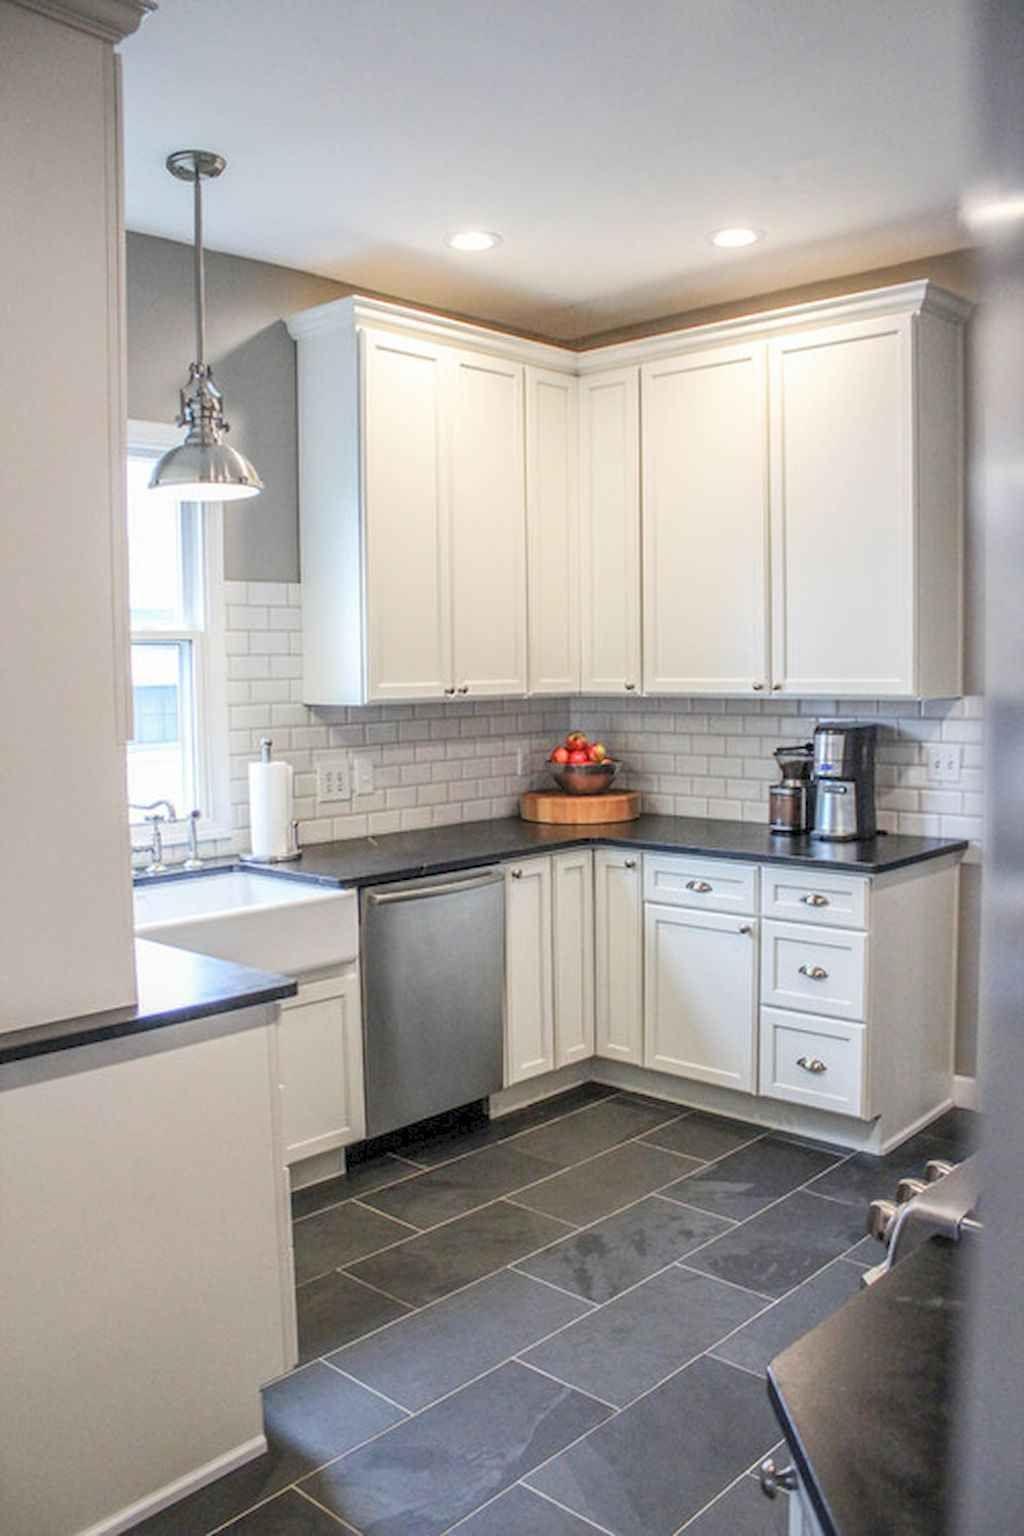 70 tile floor farmhouse kitchen decor ideas 37